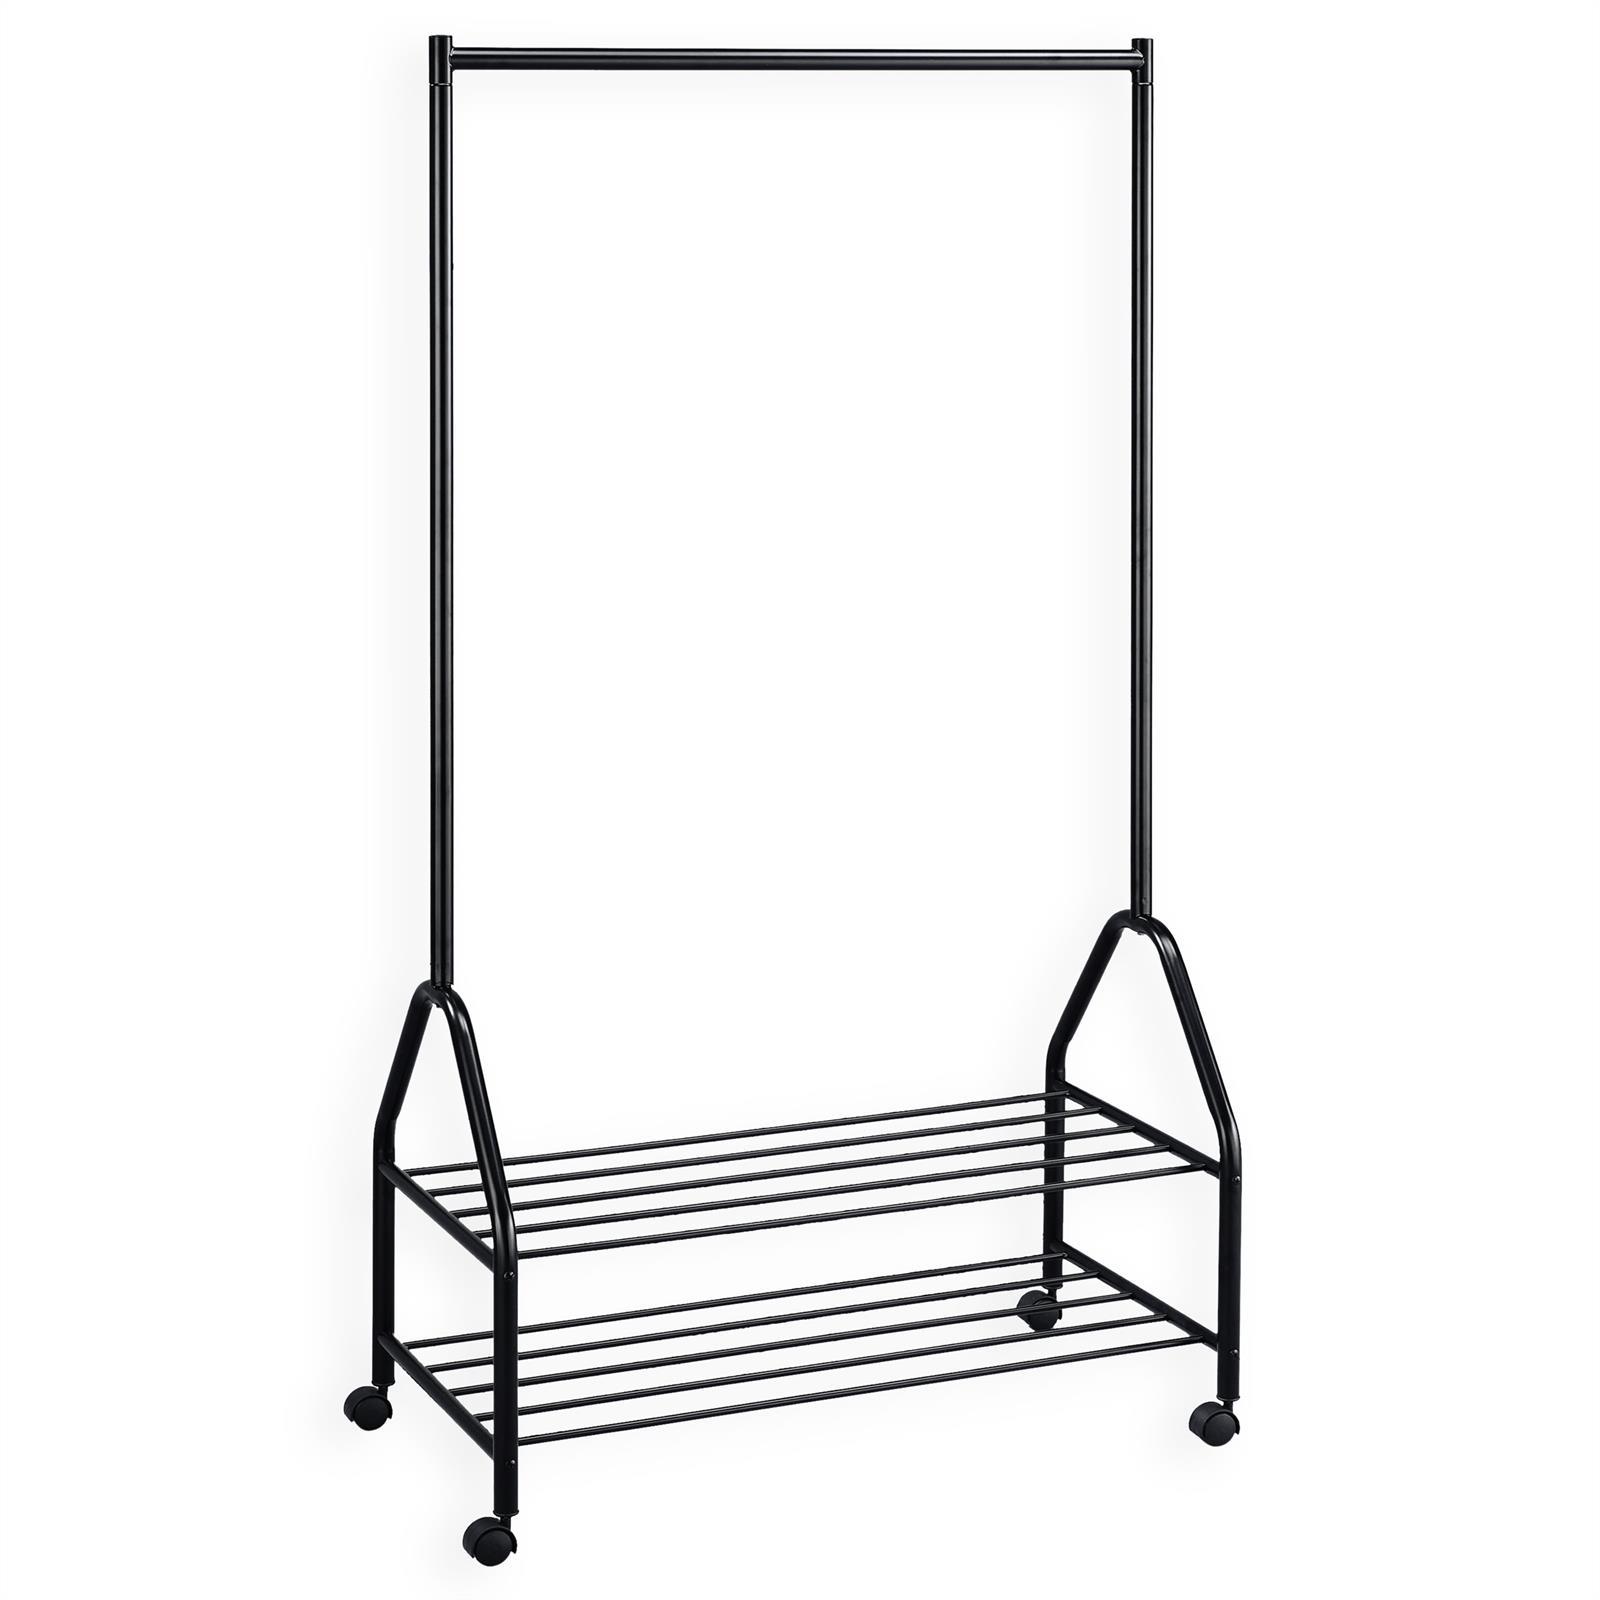 rollgarderobe ebony mit 2 ablagen schwarz mobilia24. Black Bedroom Furniture Sets. Home Design Ideas